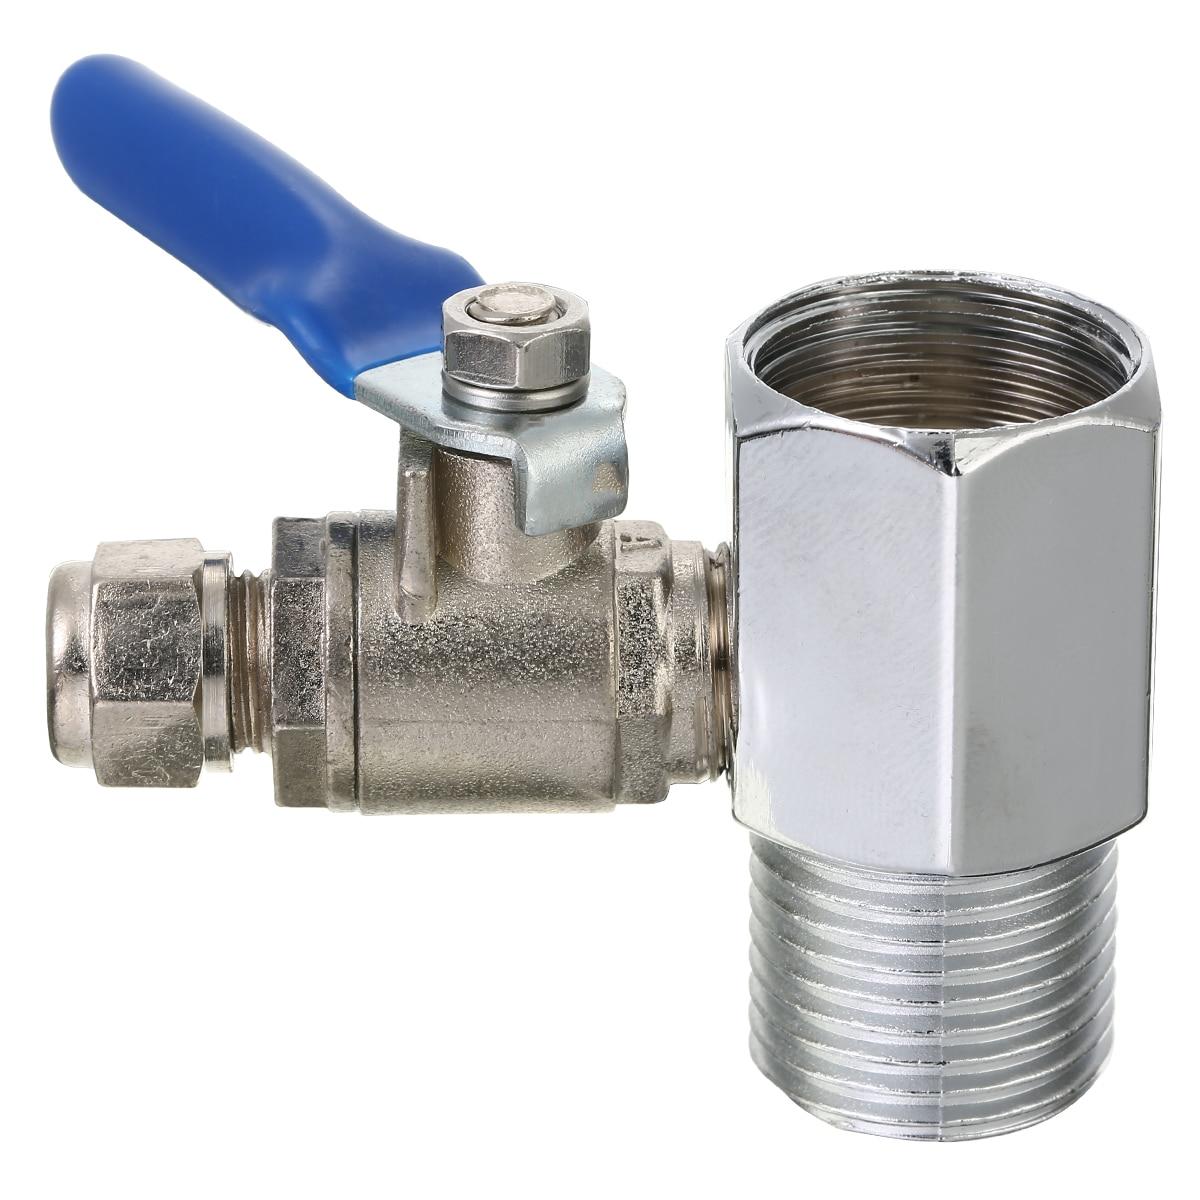 Mayitr Water Adapter 1/2